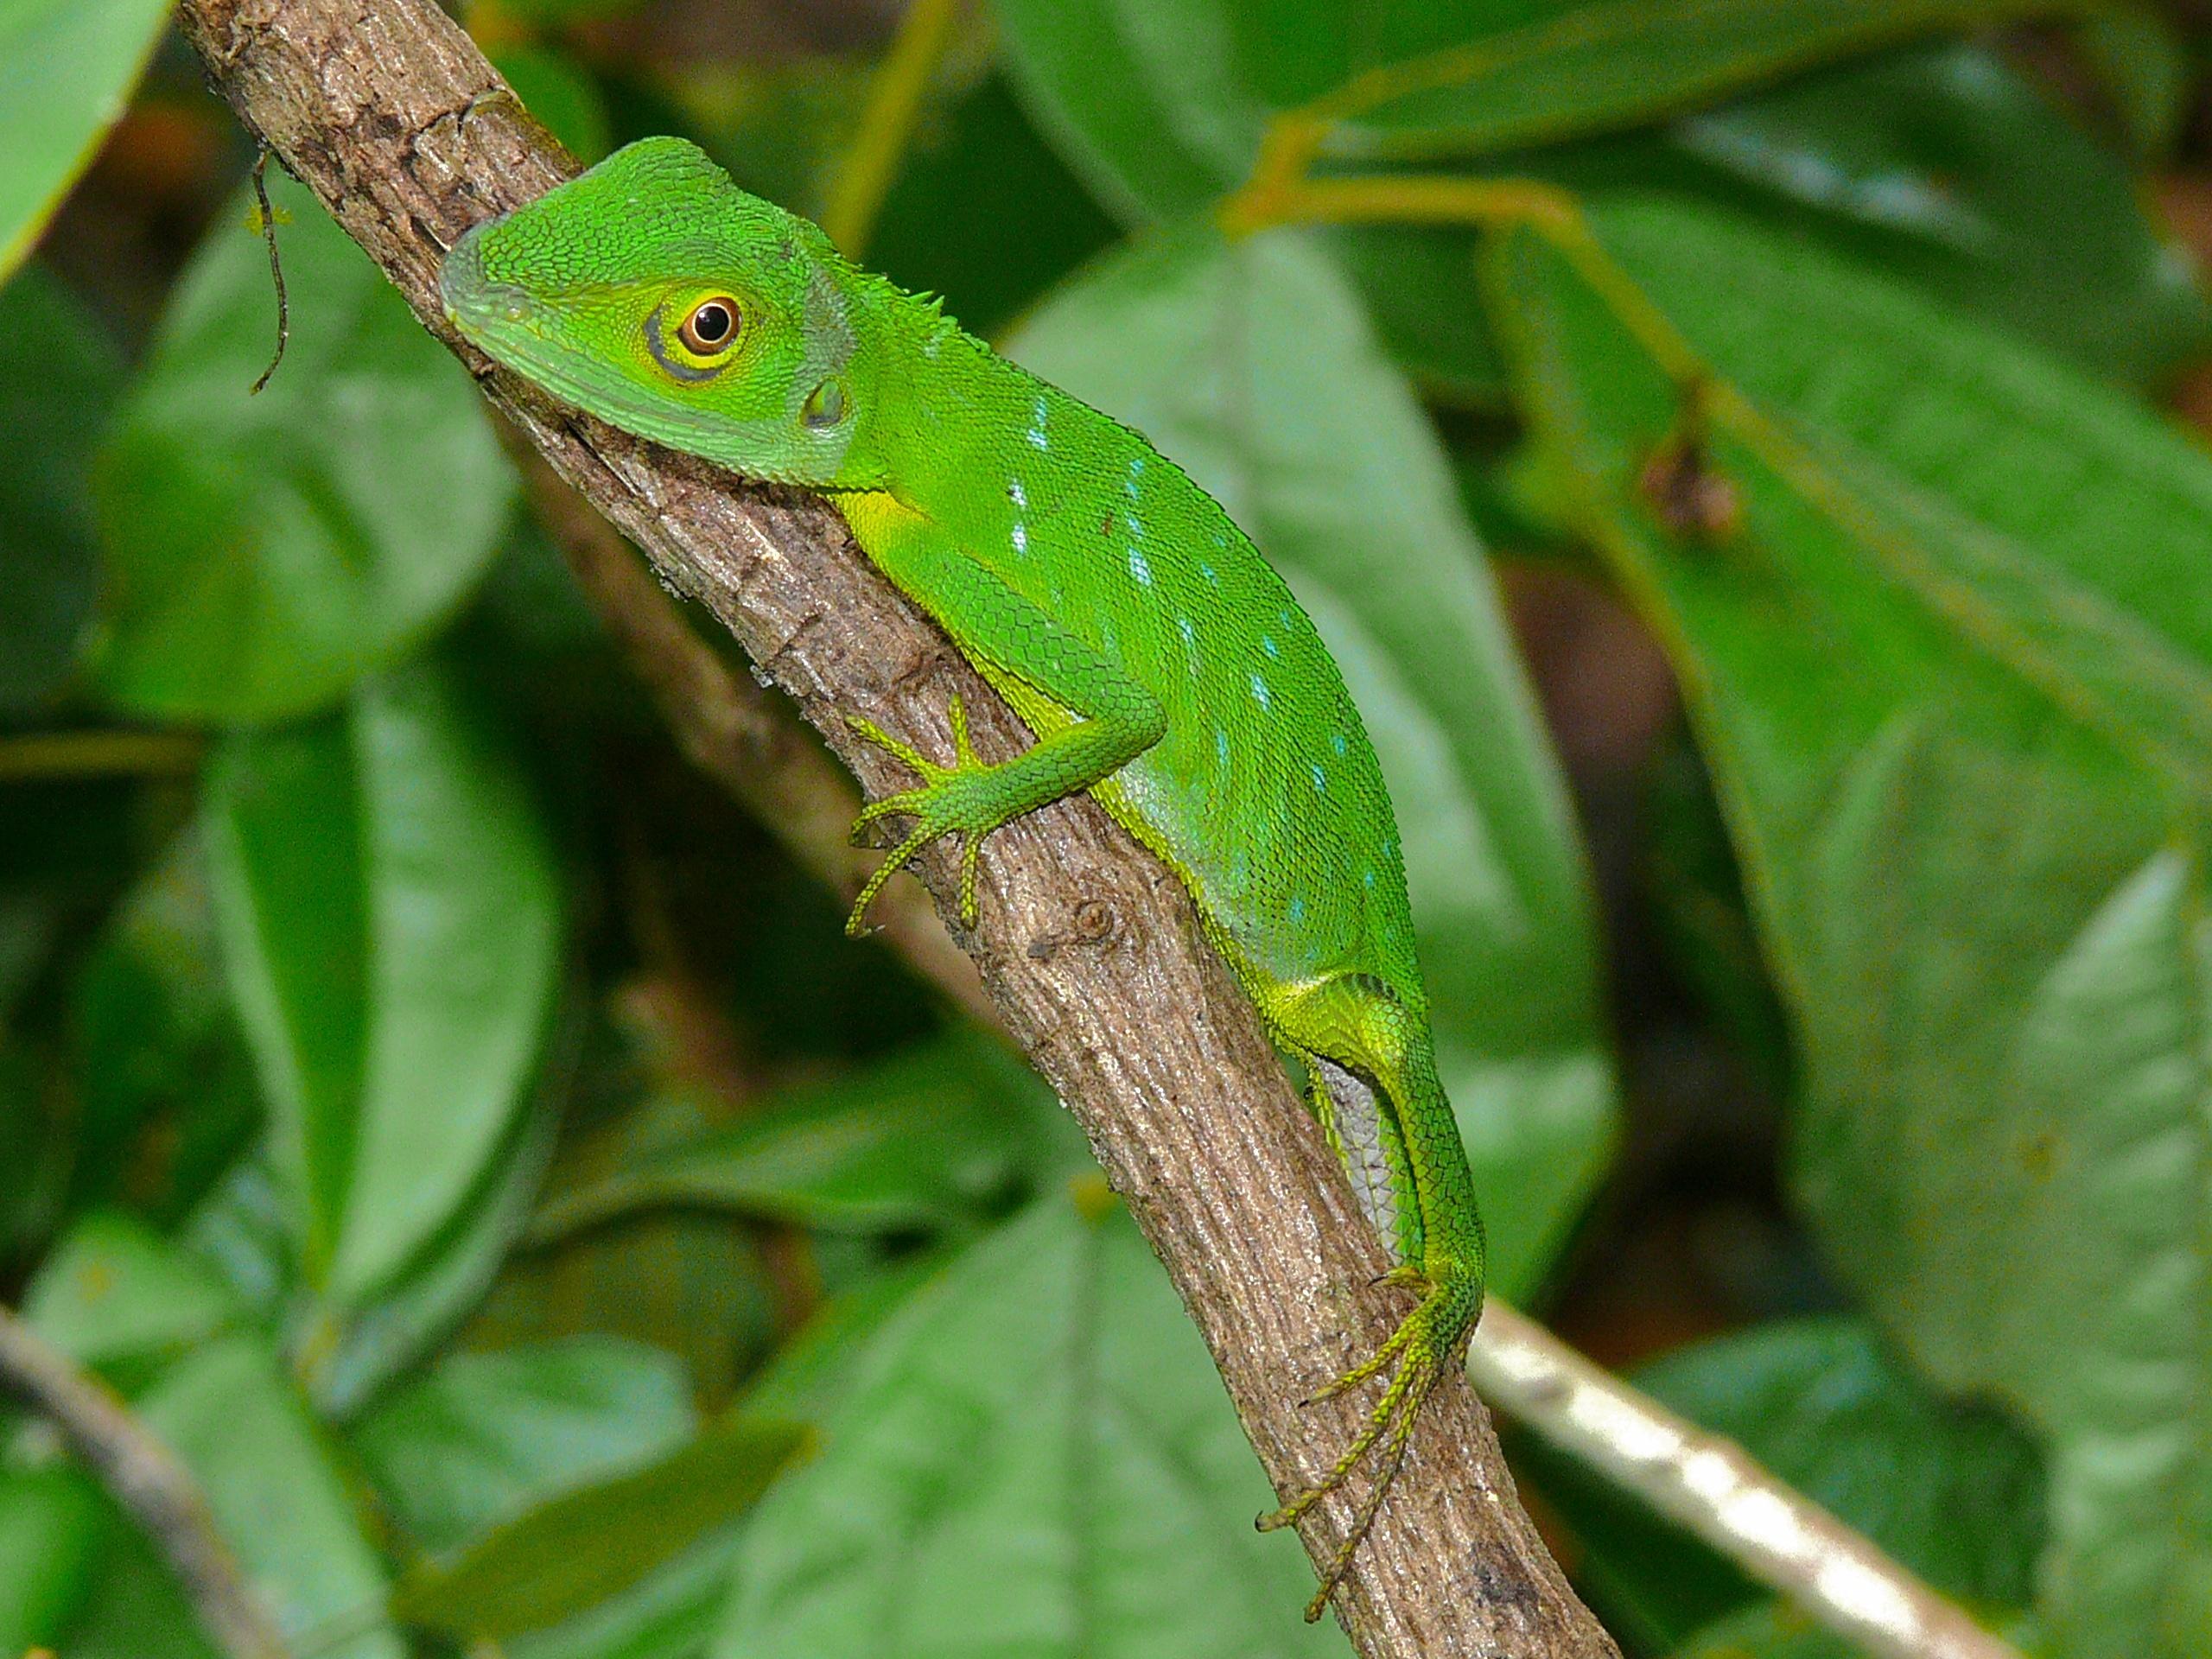 File:Green Crested Lizard (Bronchocela cristatella) (6748027981).jpg ...